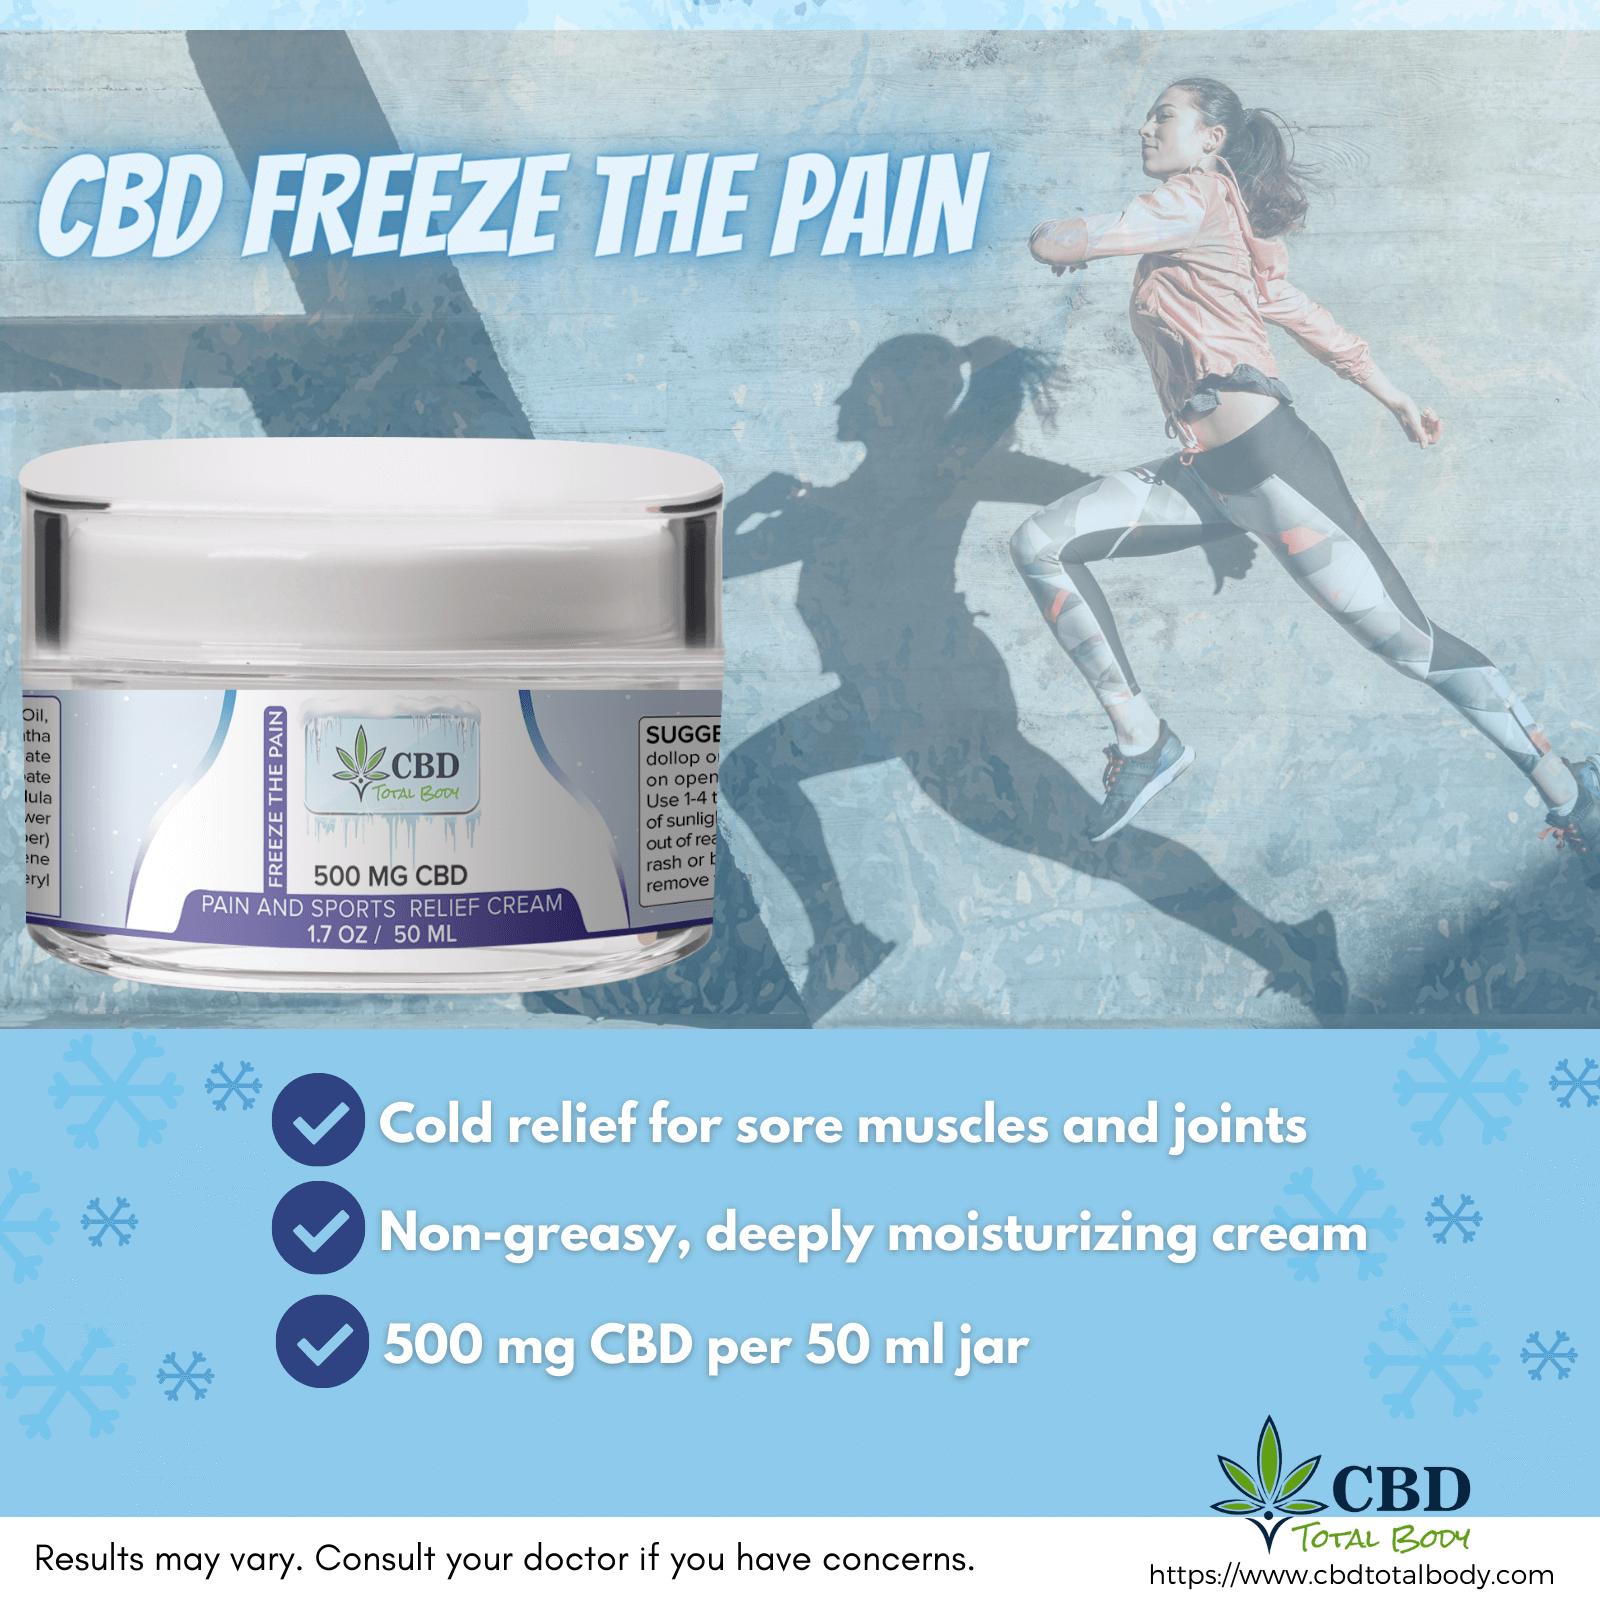 CBD Freeze The Pain Cream 1.7 oz Jar Infographic